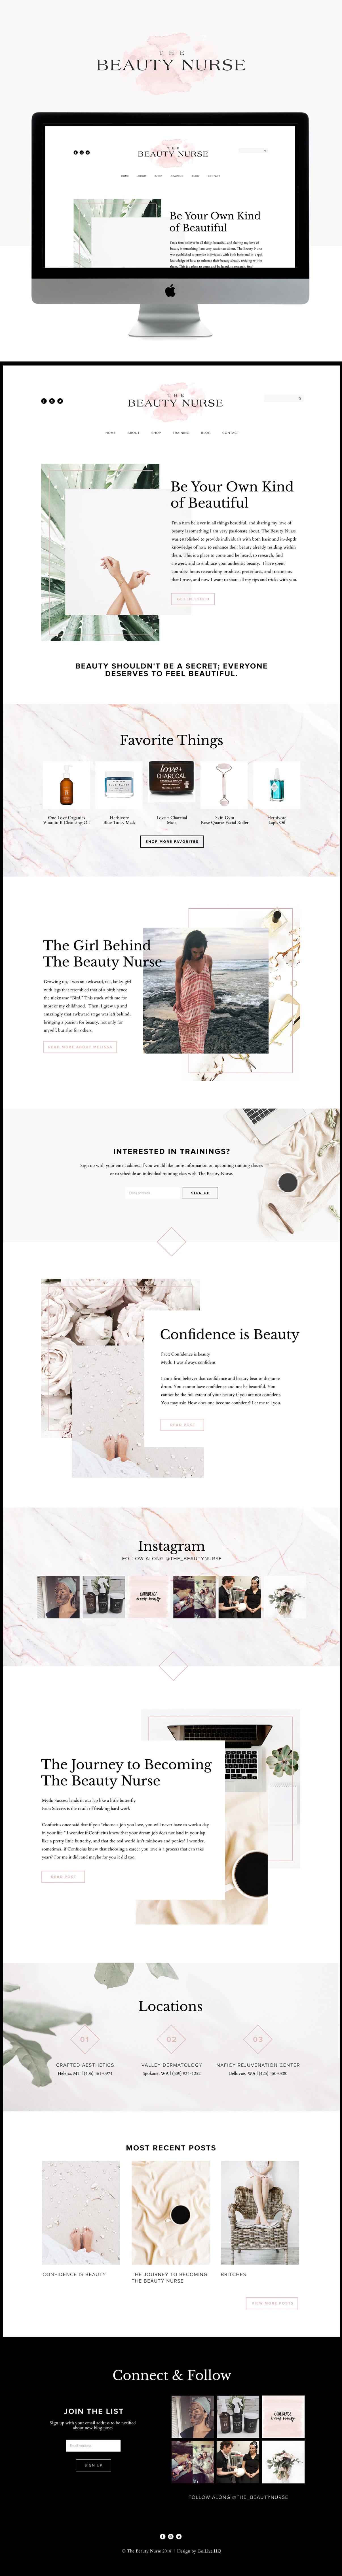 Creative & Feminine Website Design for Beauty Nurse | Website Design by Go Live HQ